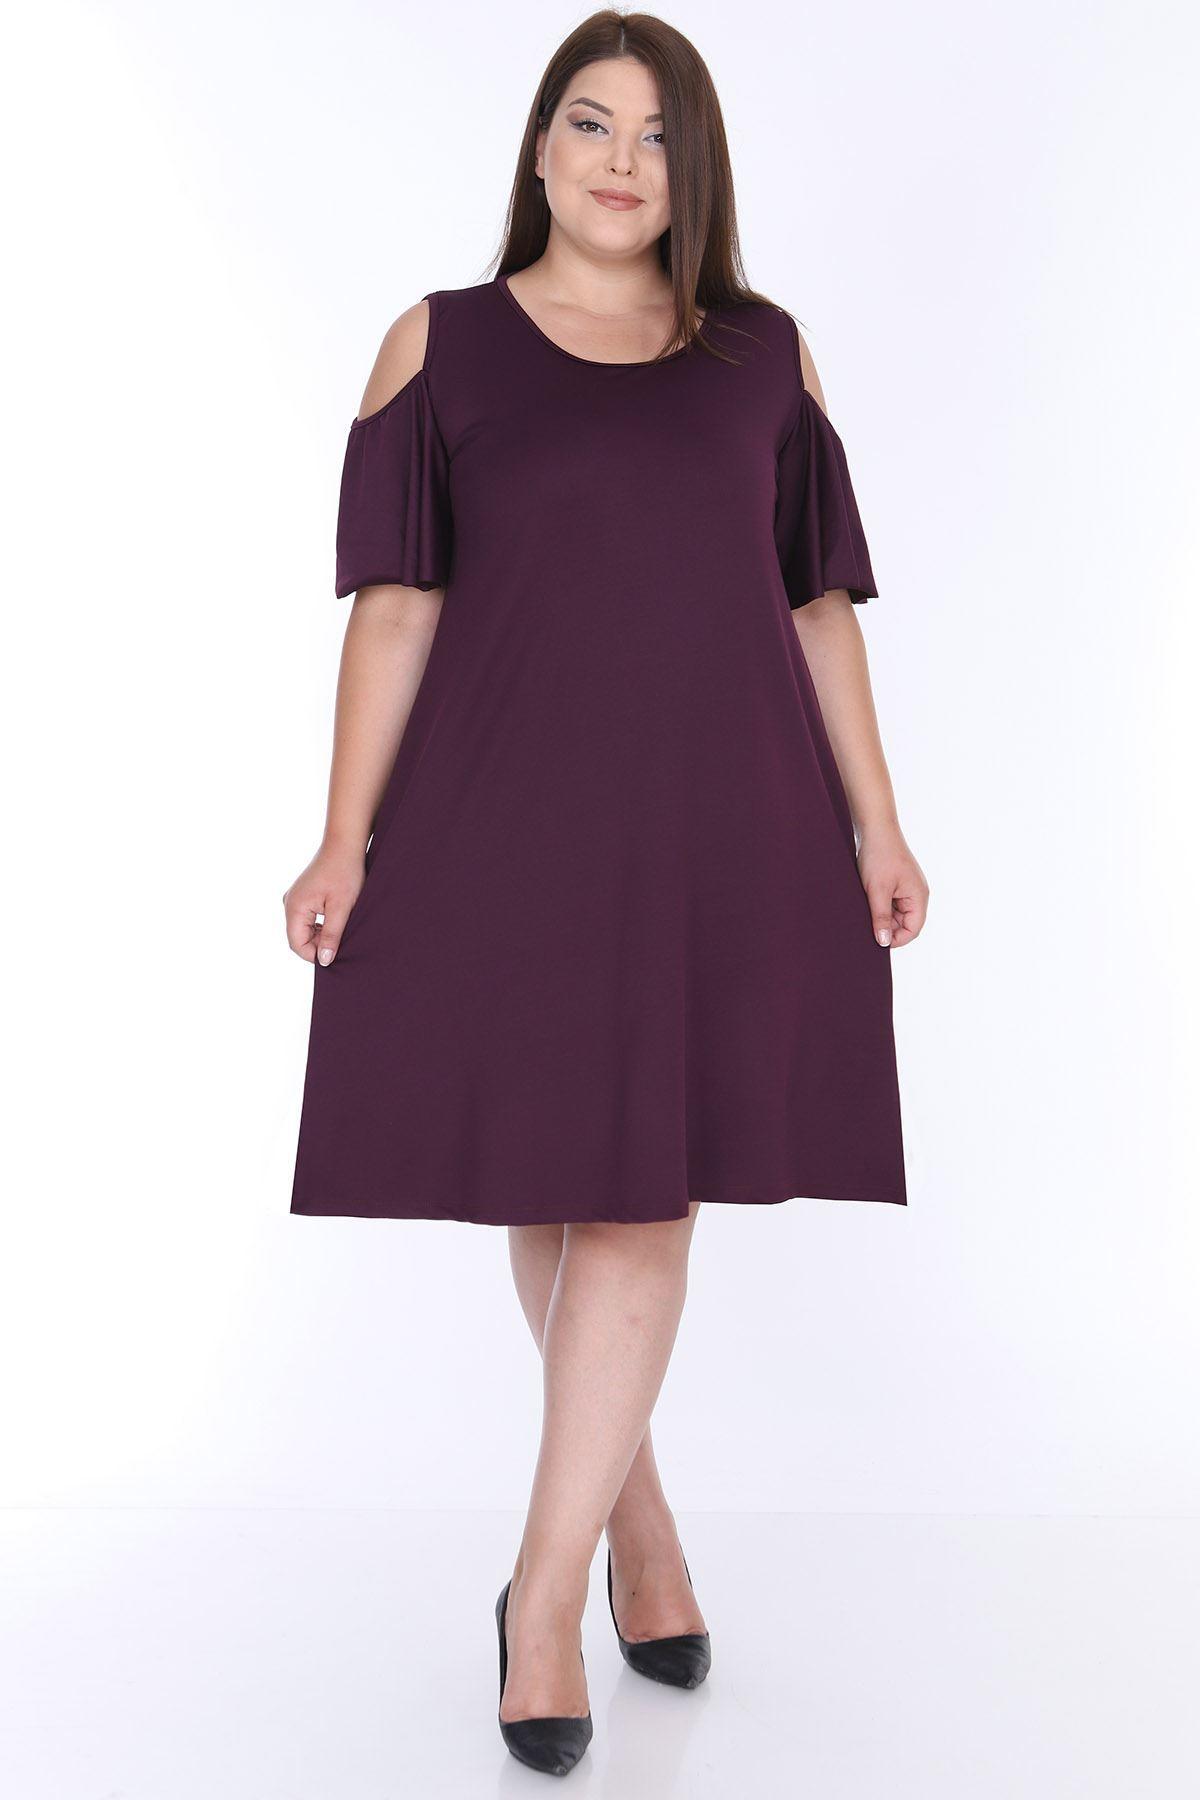 Omuzu Açık Mor Elbise 22E-0647